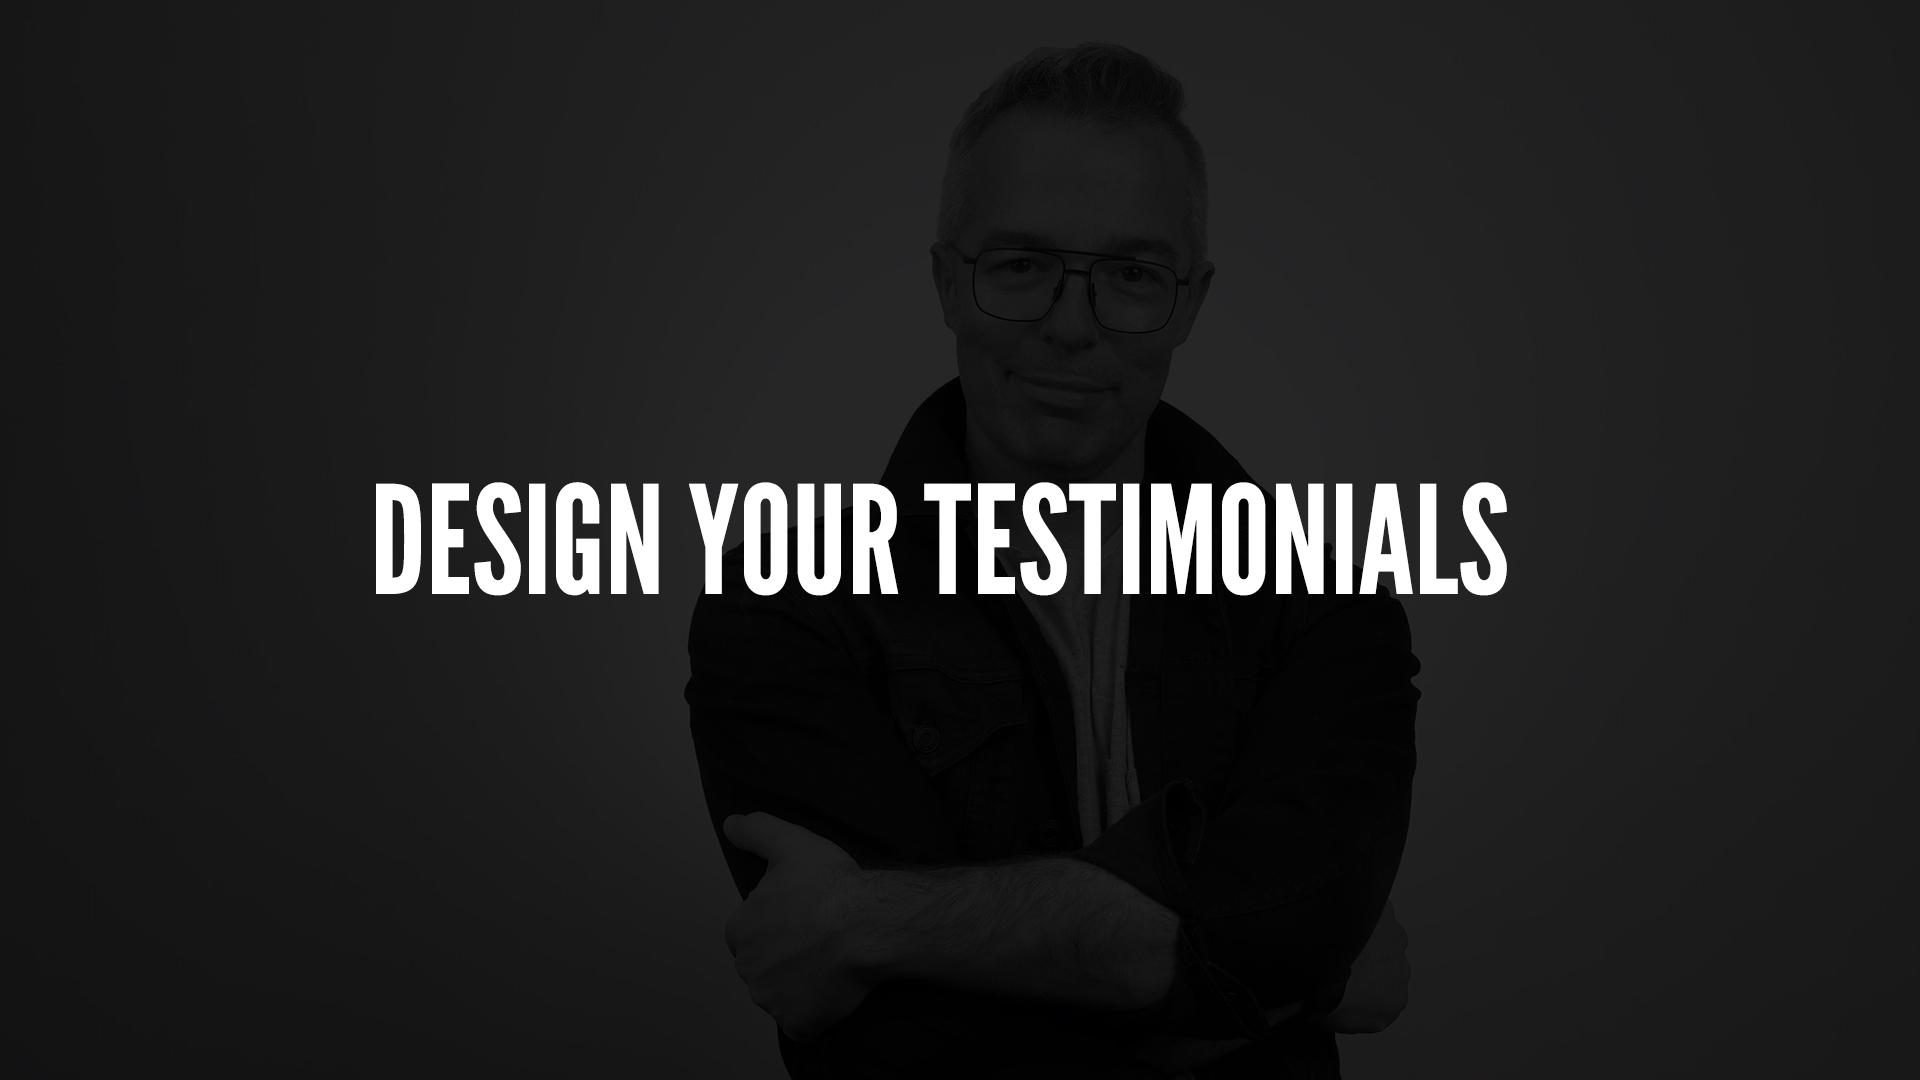 Design Your Testimonials.jpg